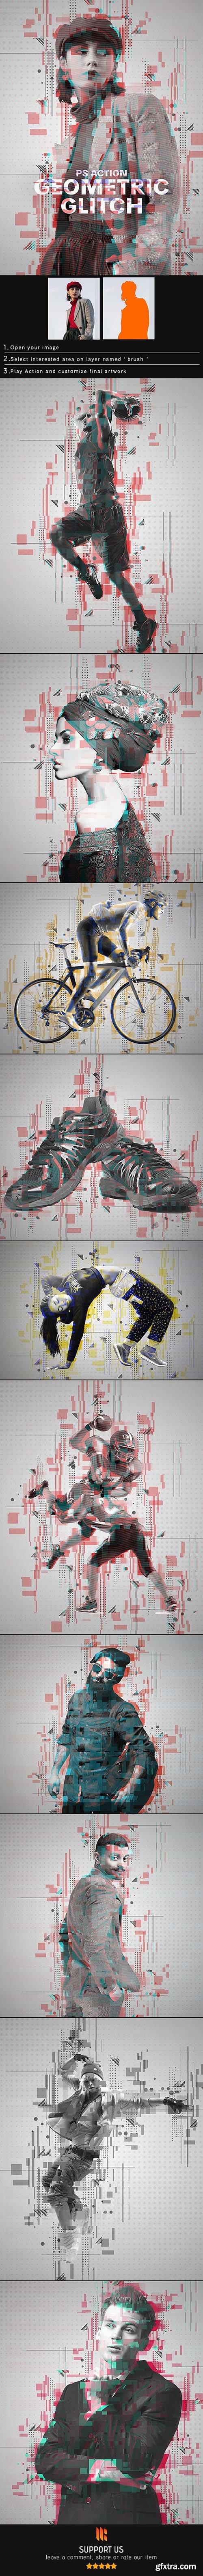 GraphicRiver - Geometric Glitch Photoshop Action 25029782